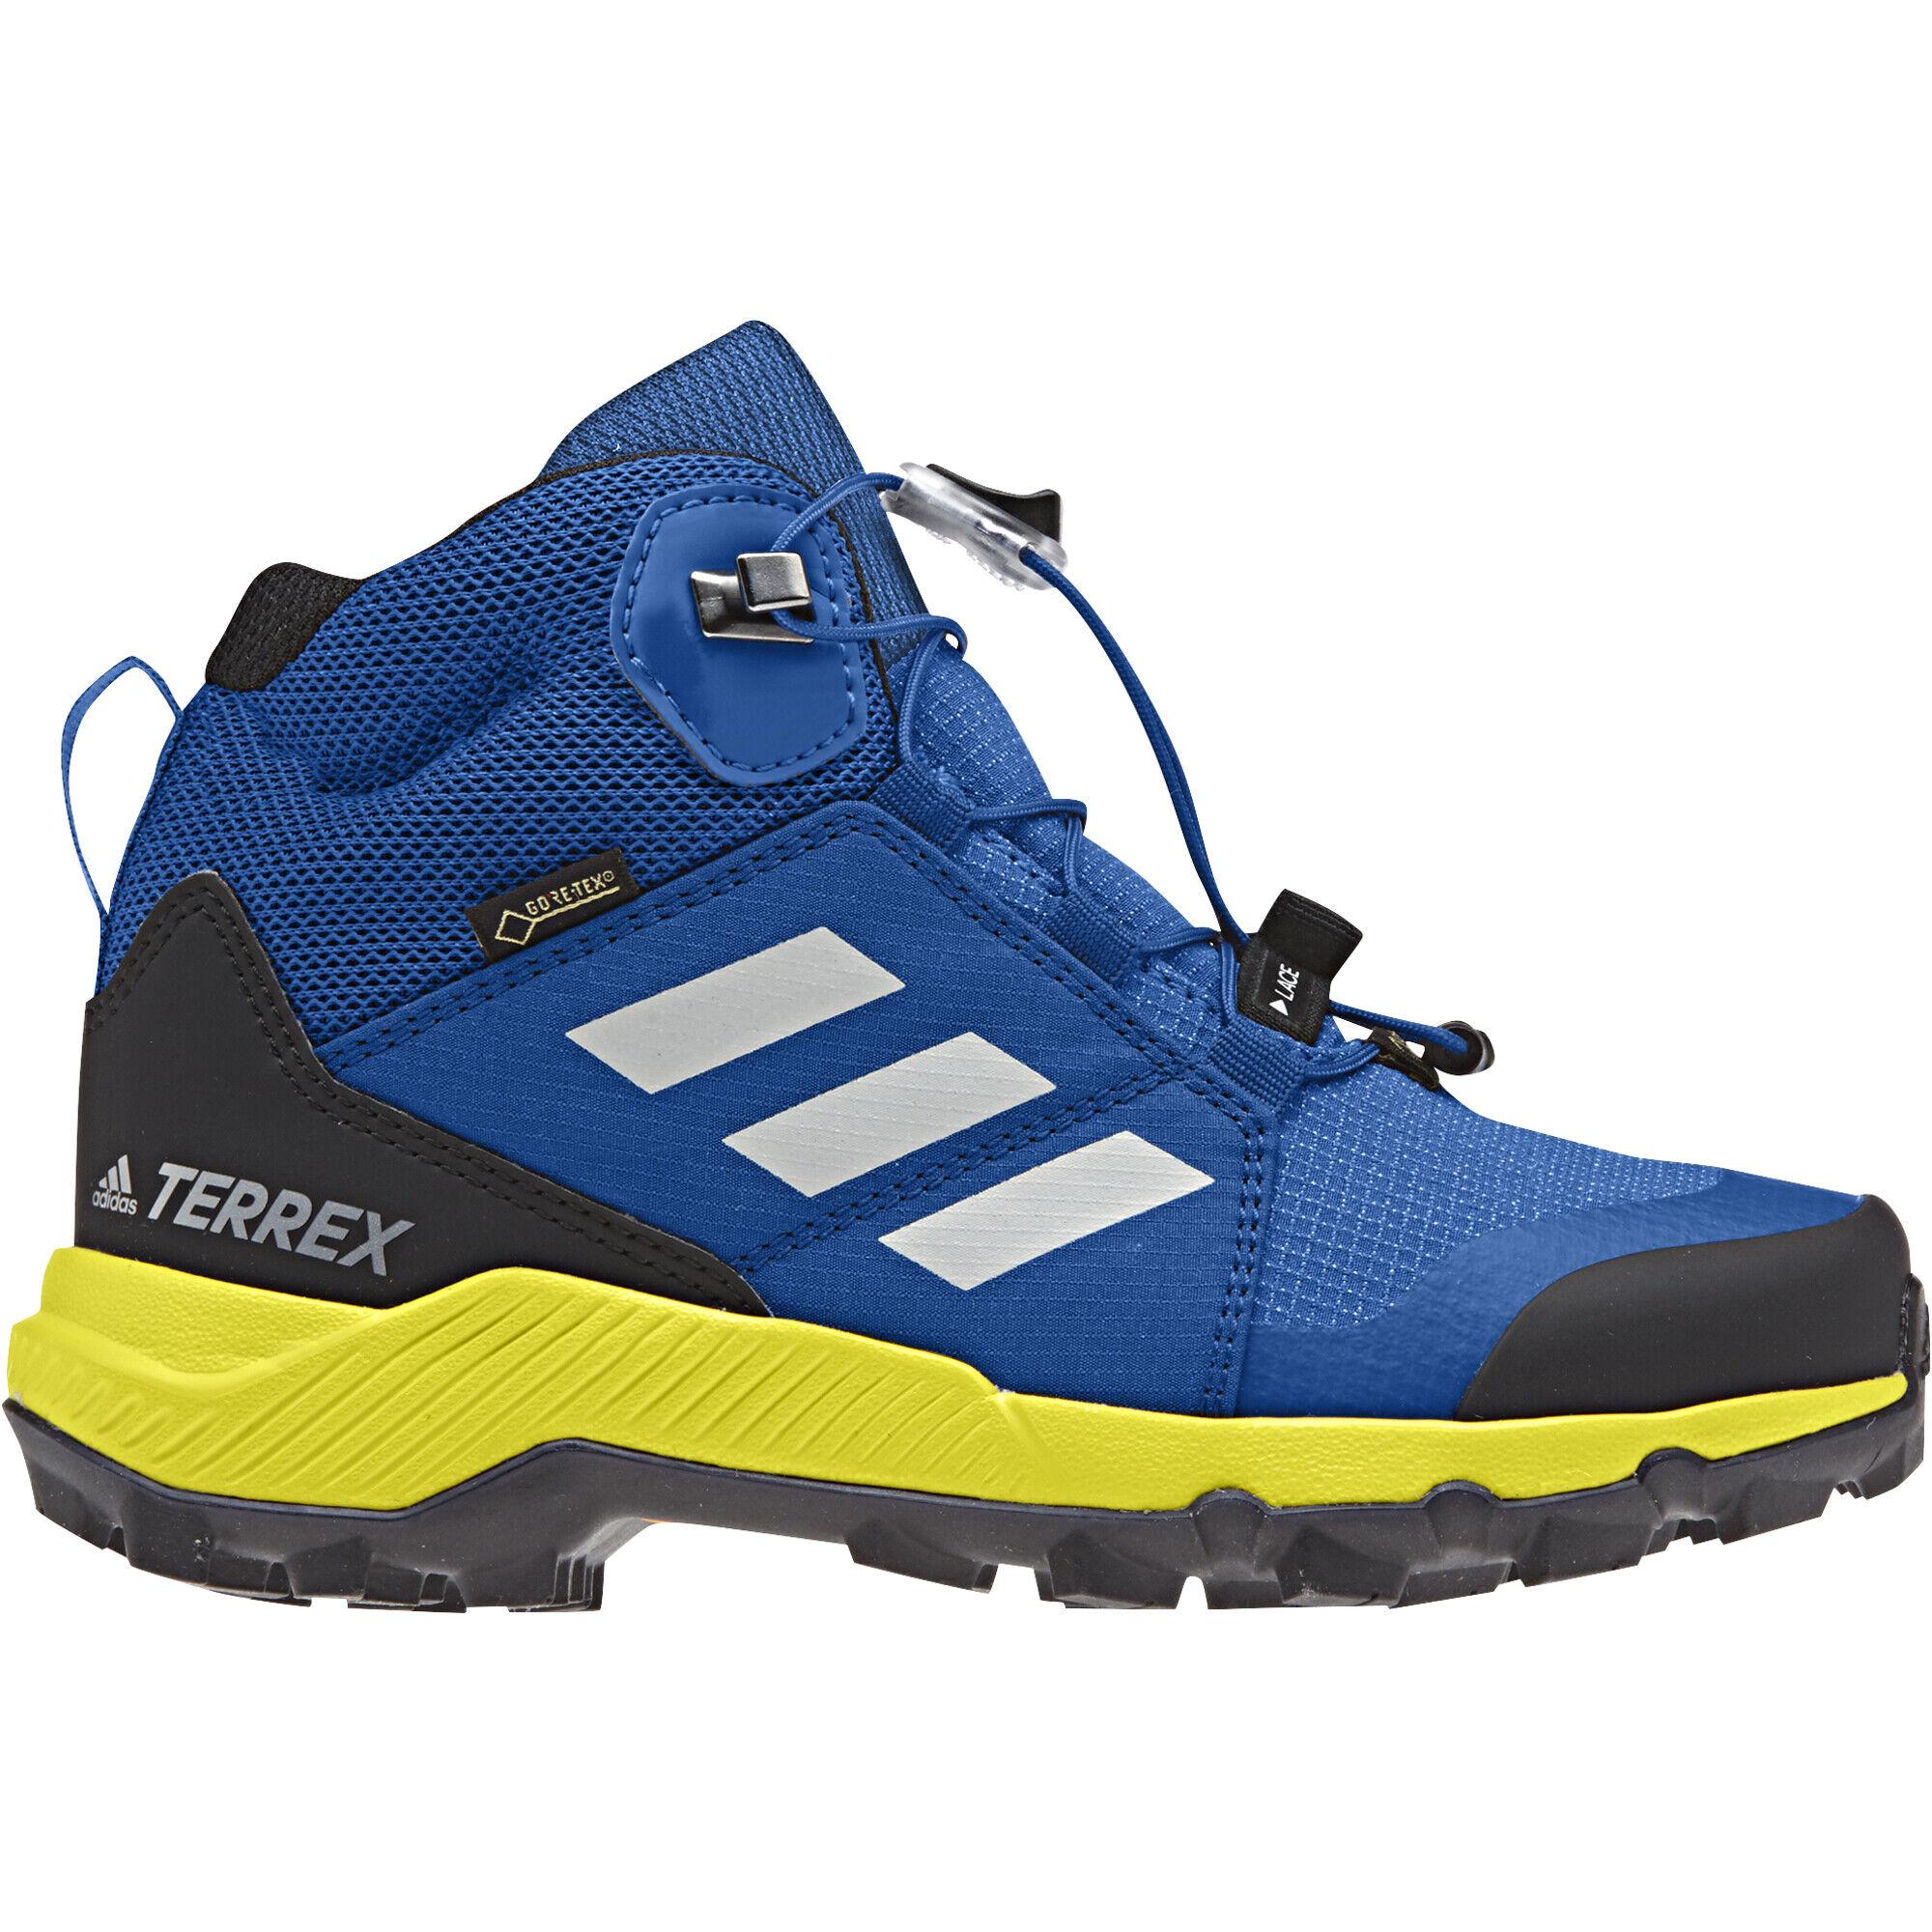 Süß Schuhe Kinder Adidas Performance Terrex Ax2R Walking